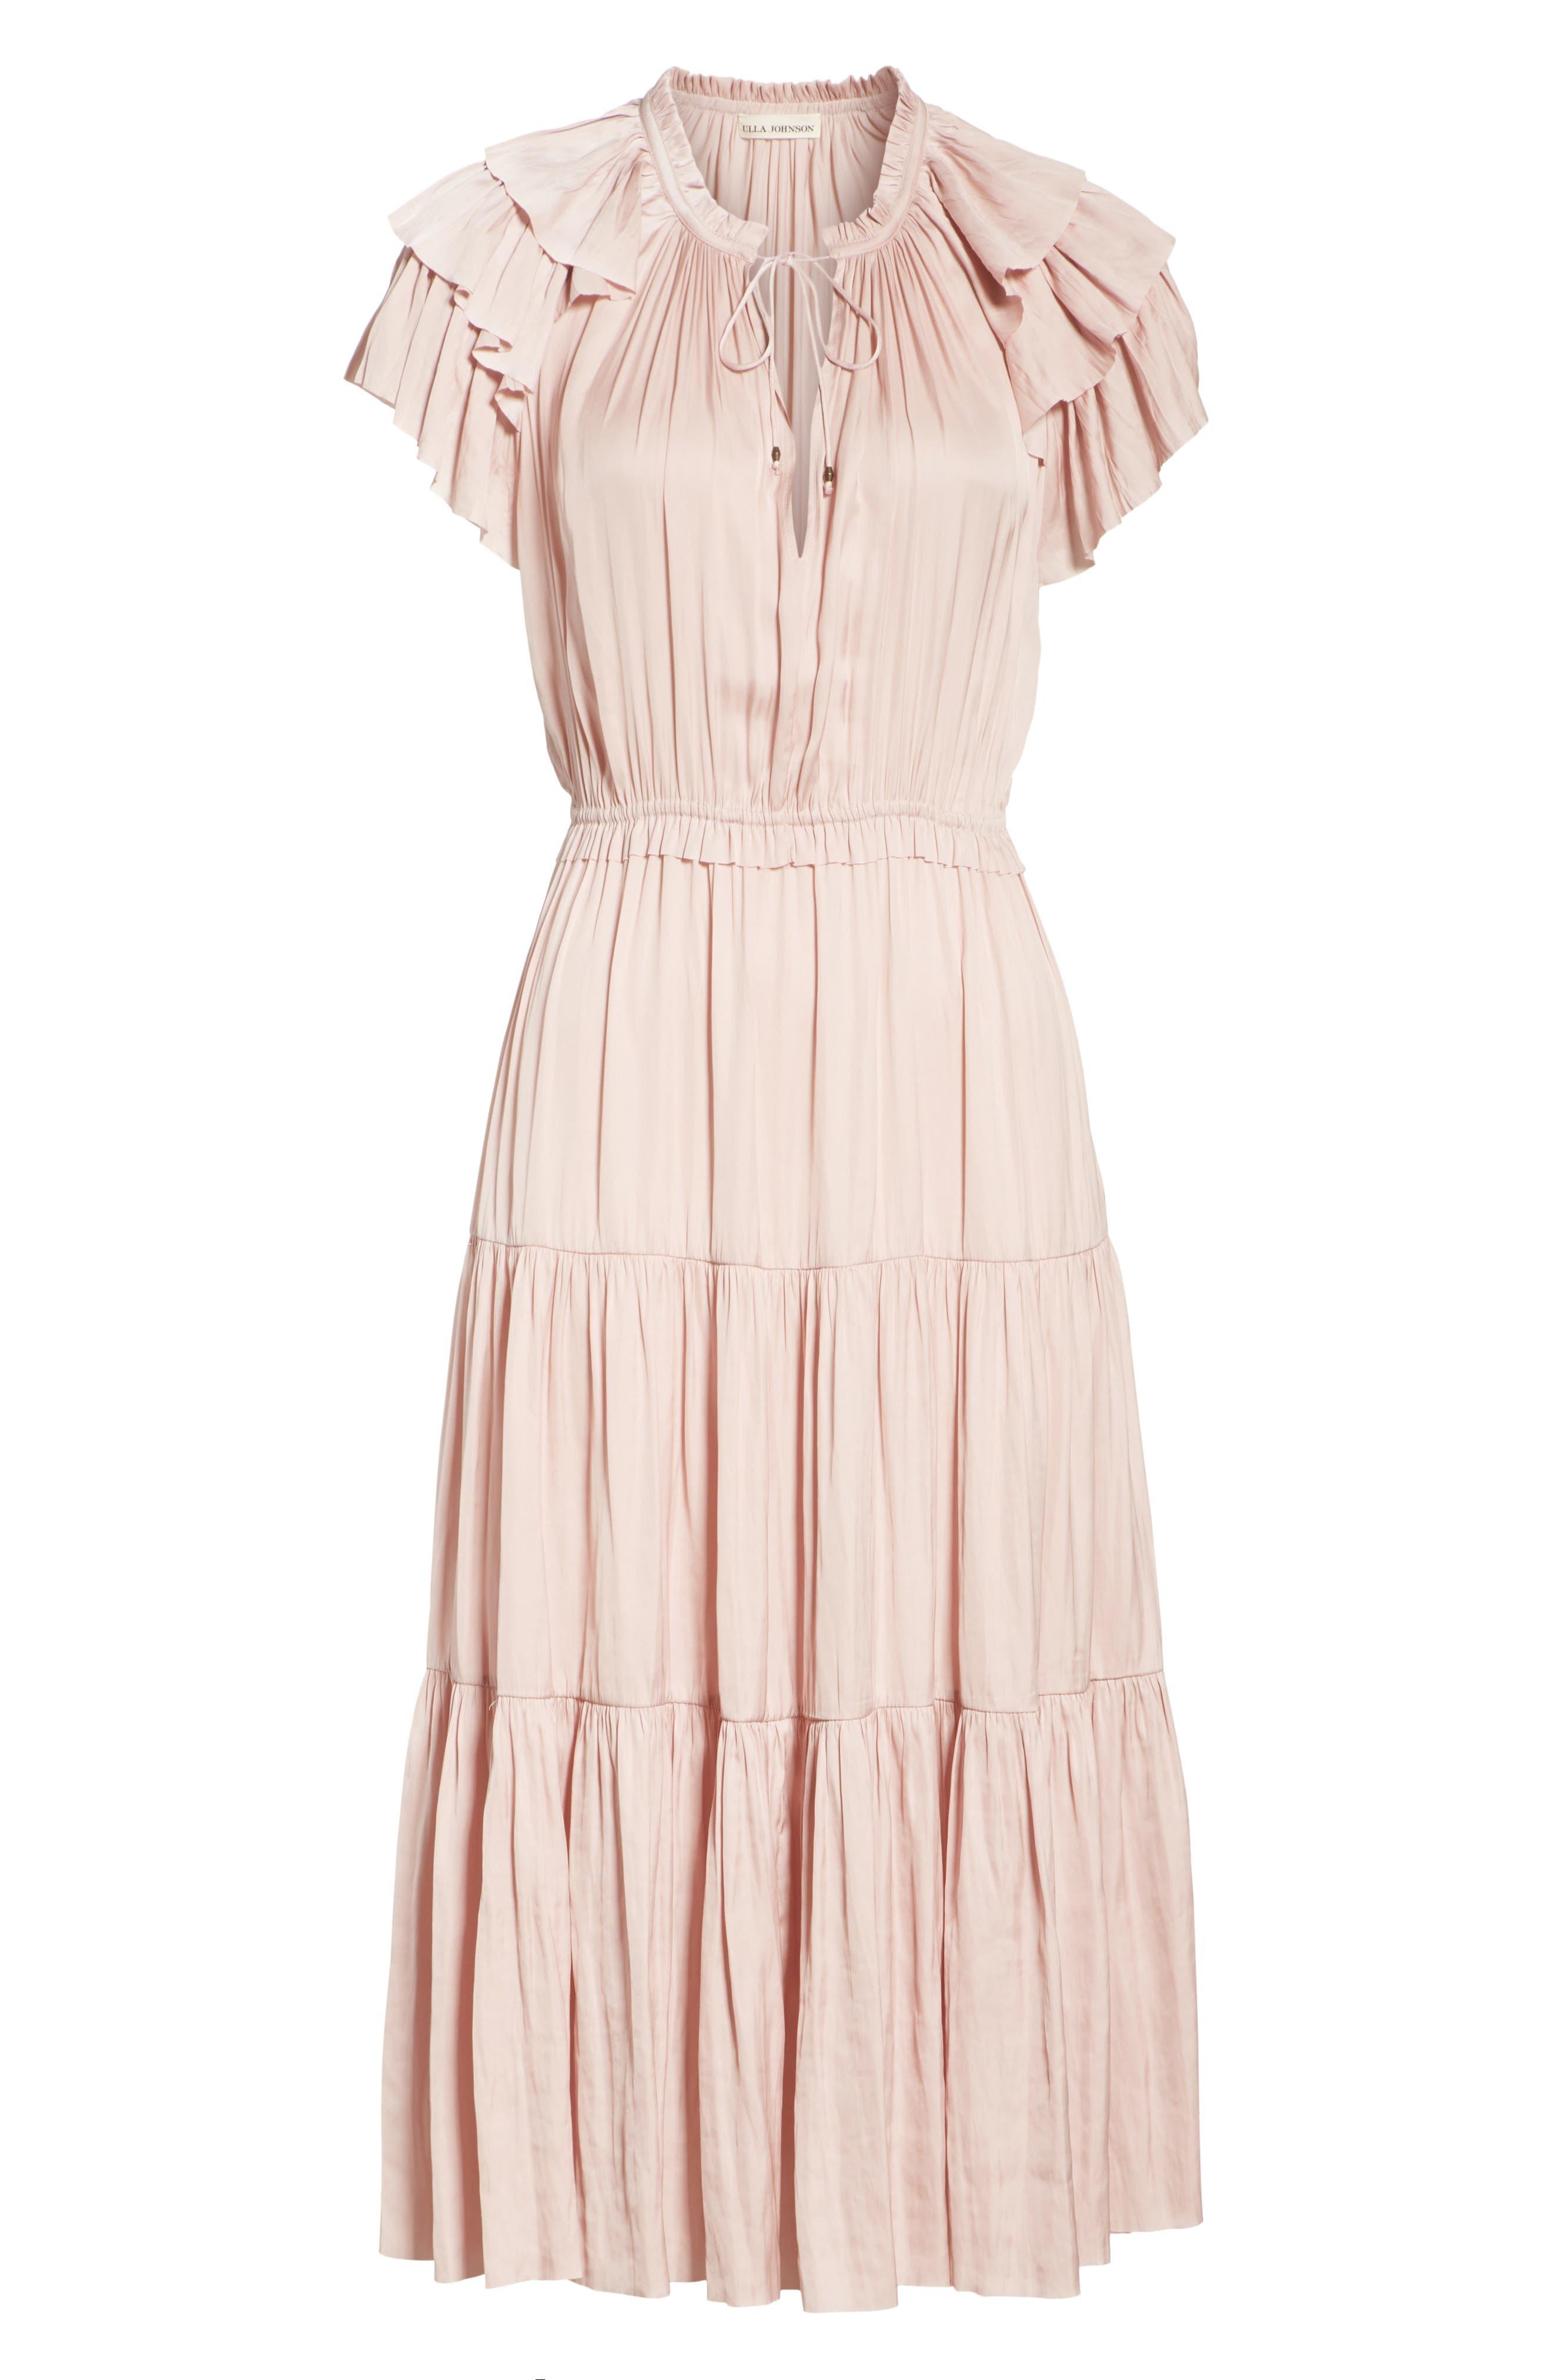 Blaire Satin Dress,                             Alternate thumbnail 6, color,                             600